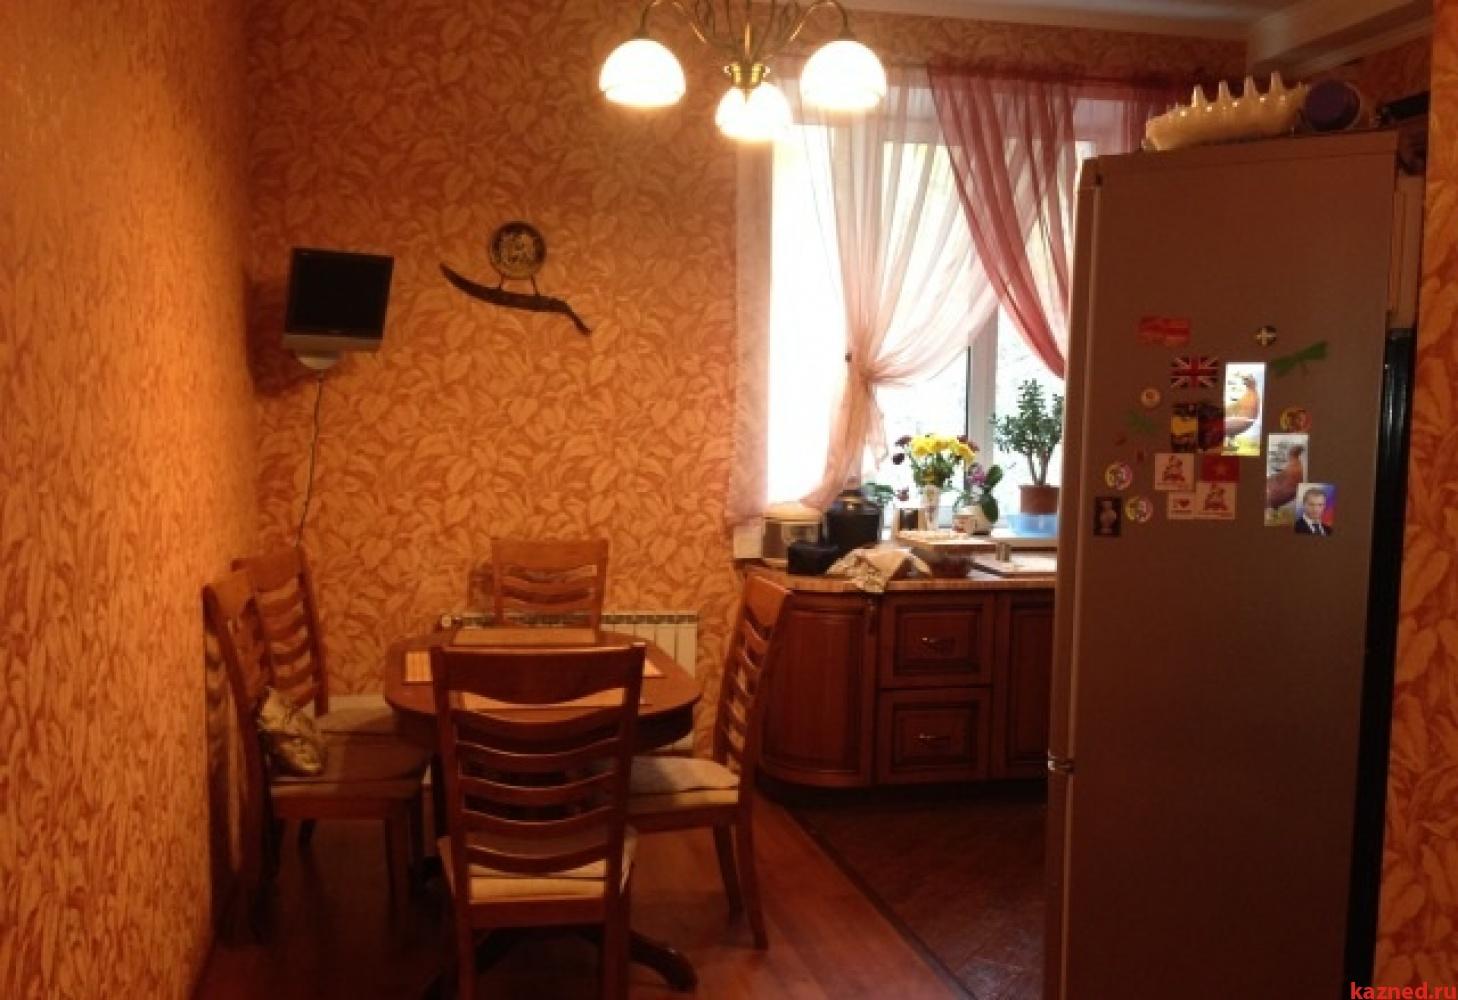 Продам 3-комн.квартиру Сибирский тракт, 22, 101 м2  (миниатюра №11)